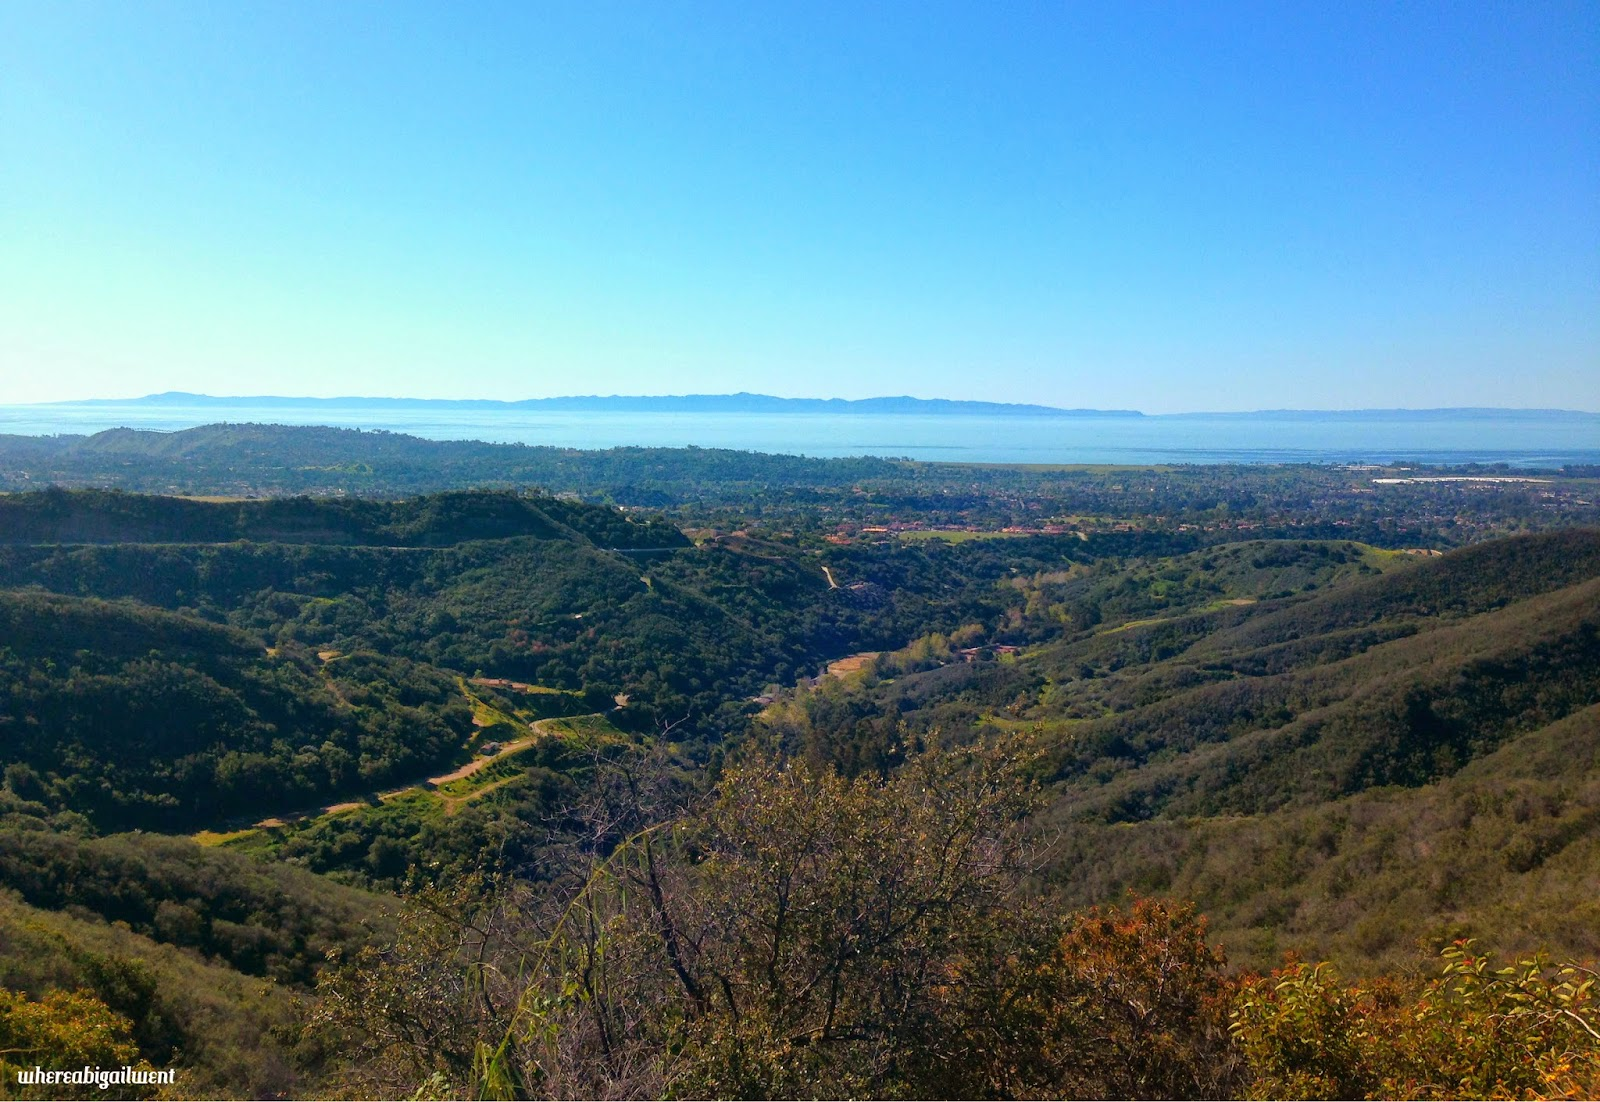 Los Padres National Park vista